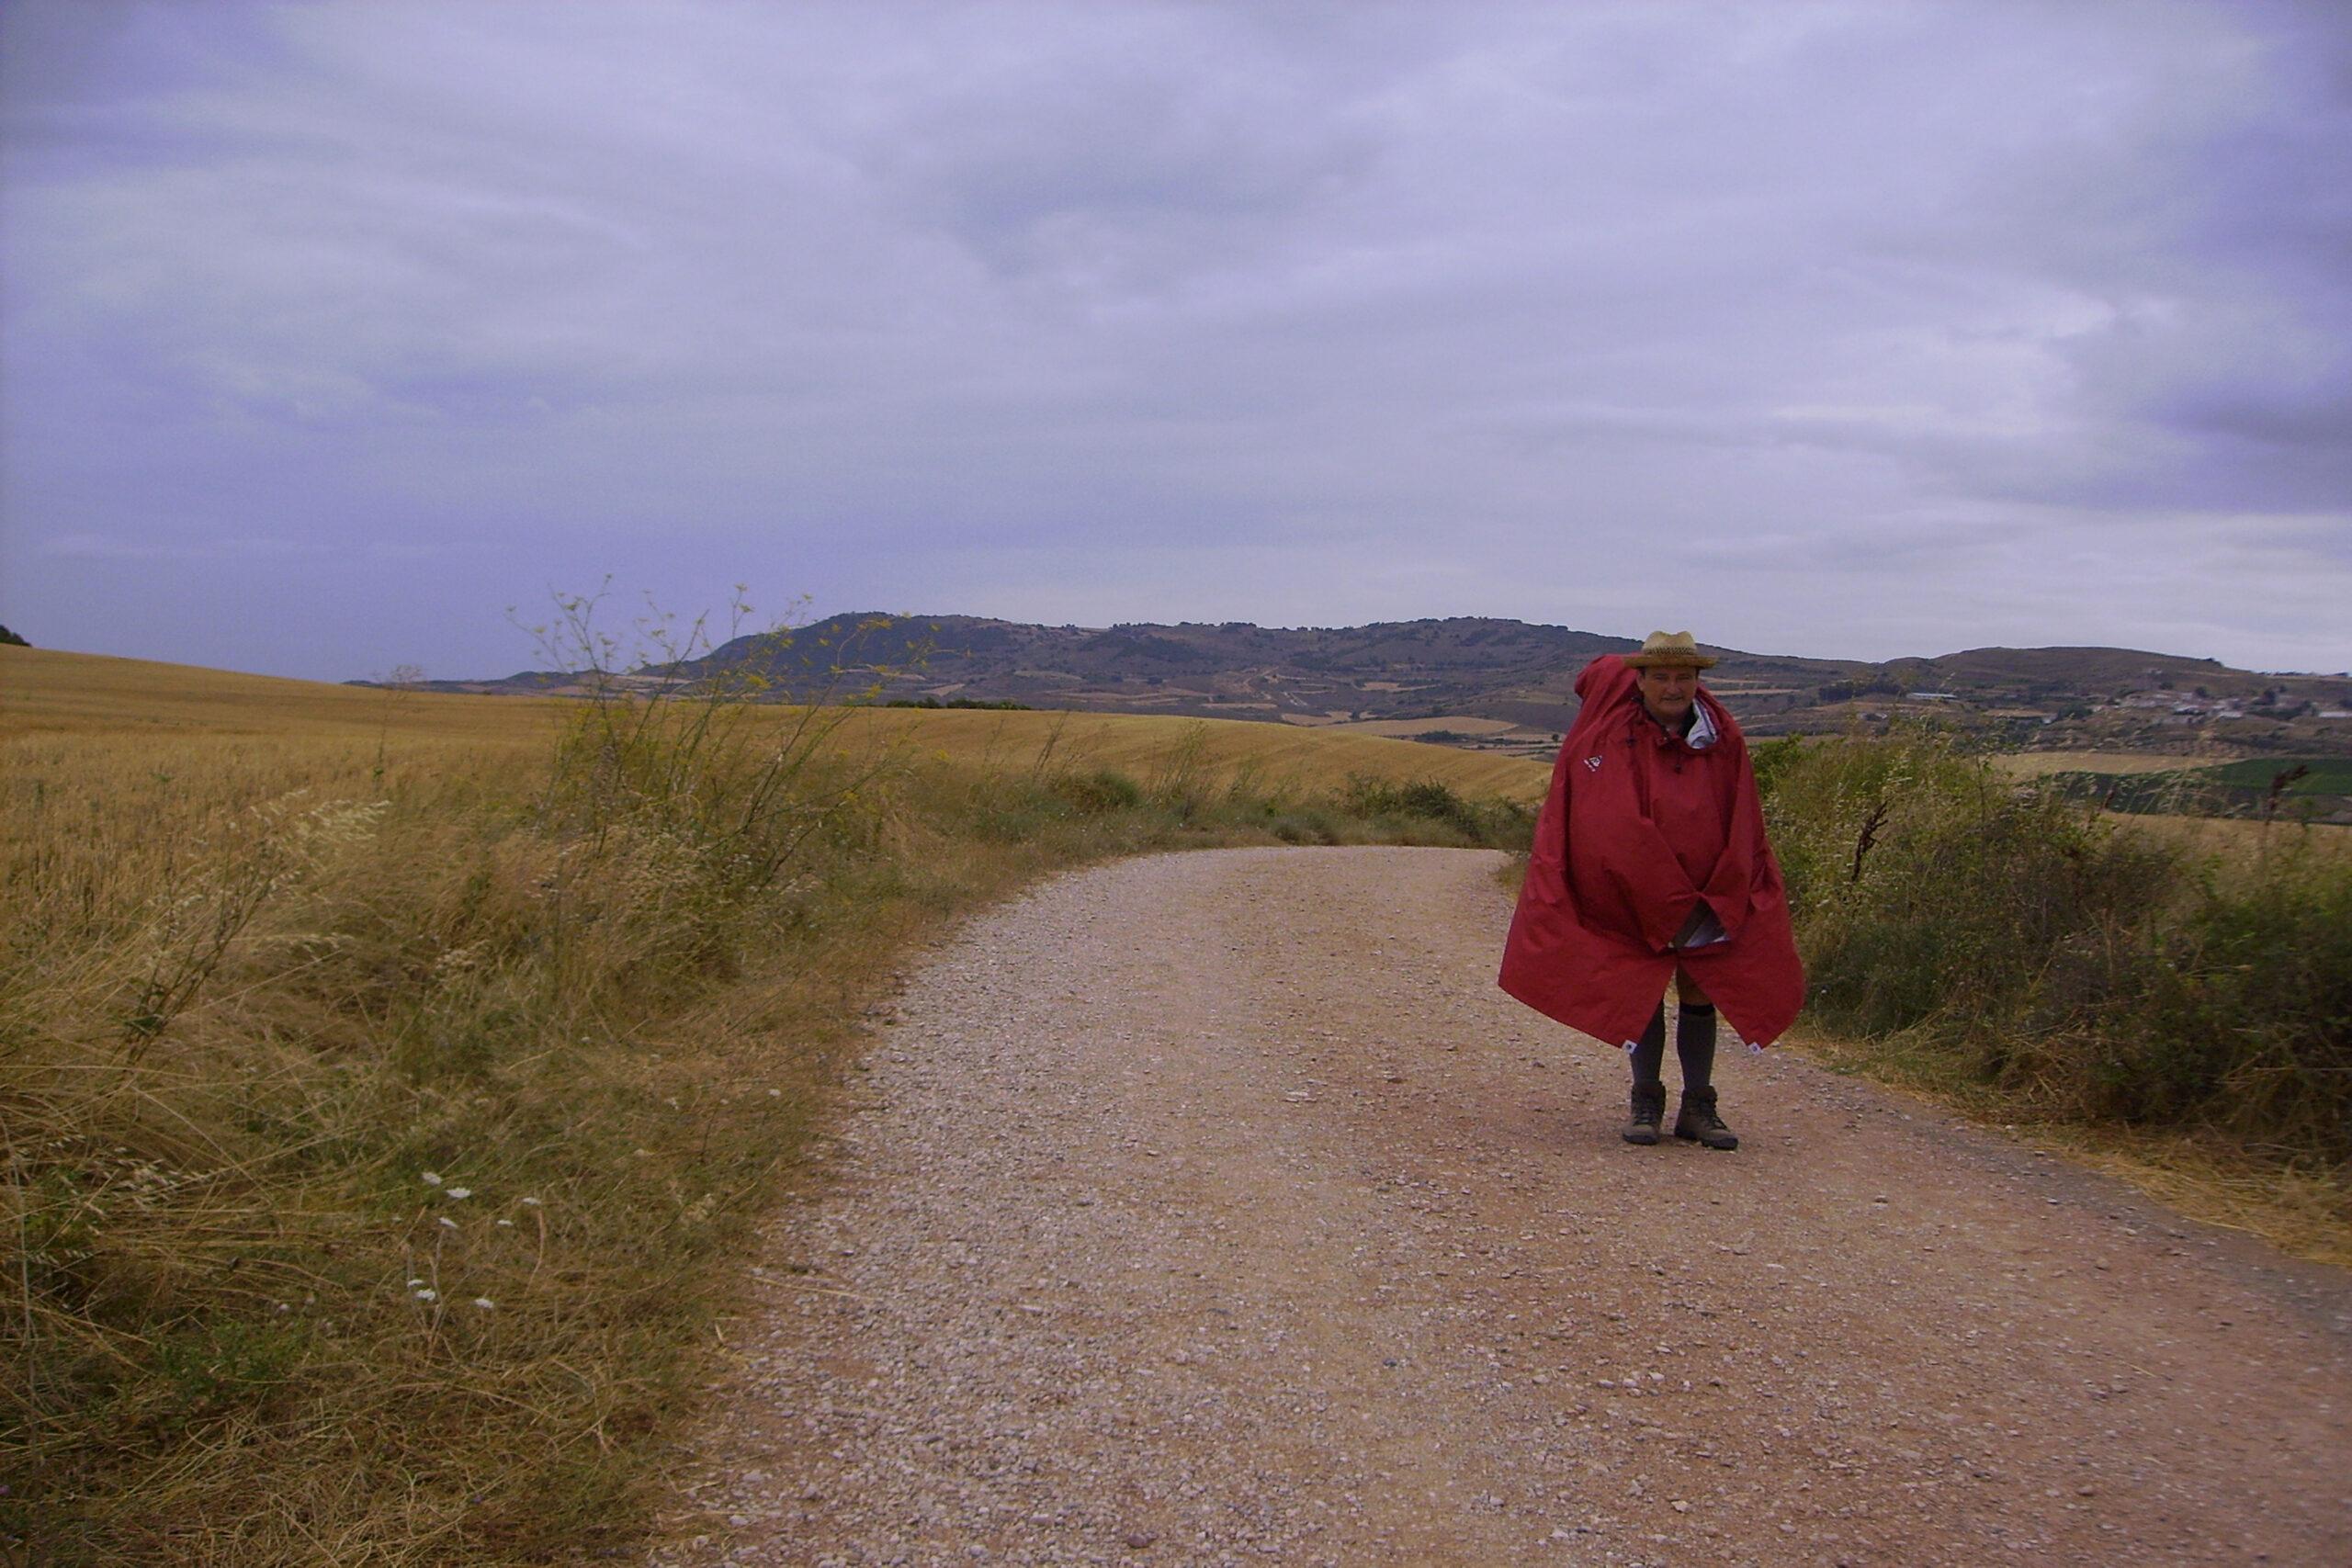 pellegrino in cammino motoevasioni tour di san francesco